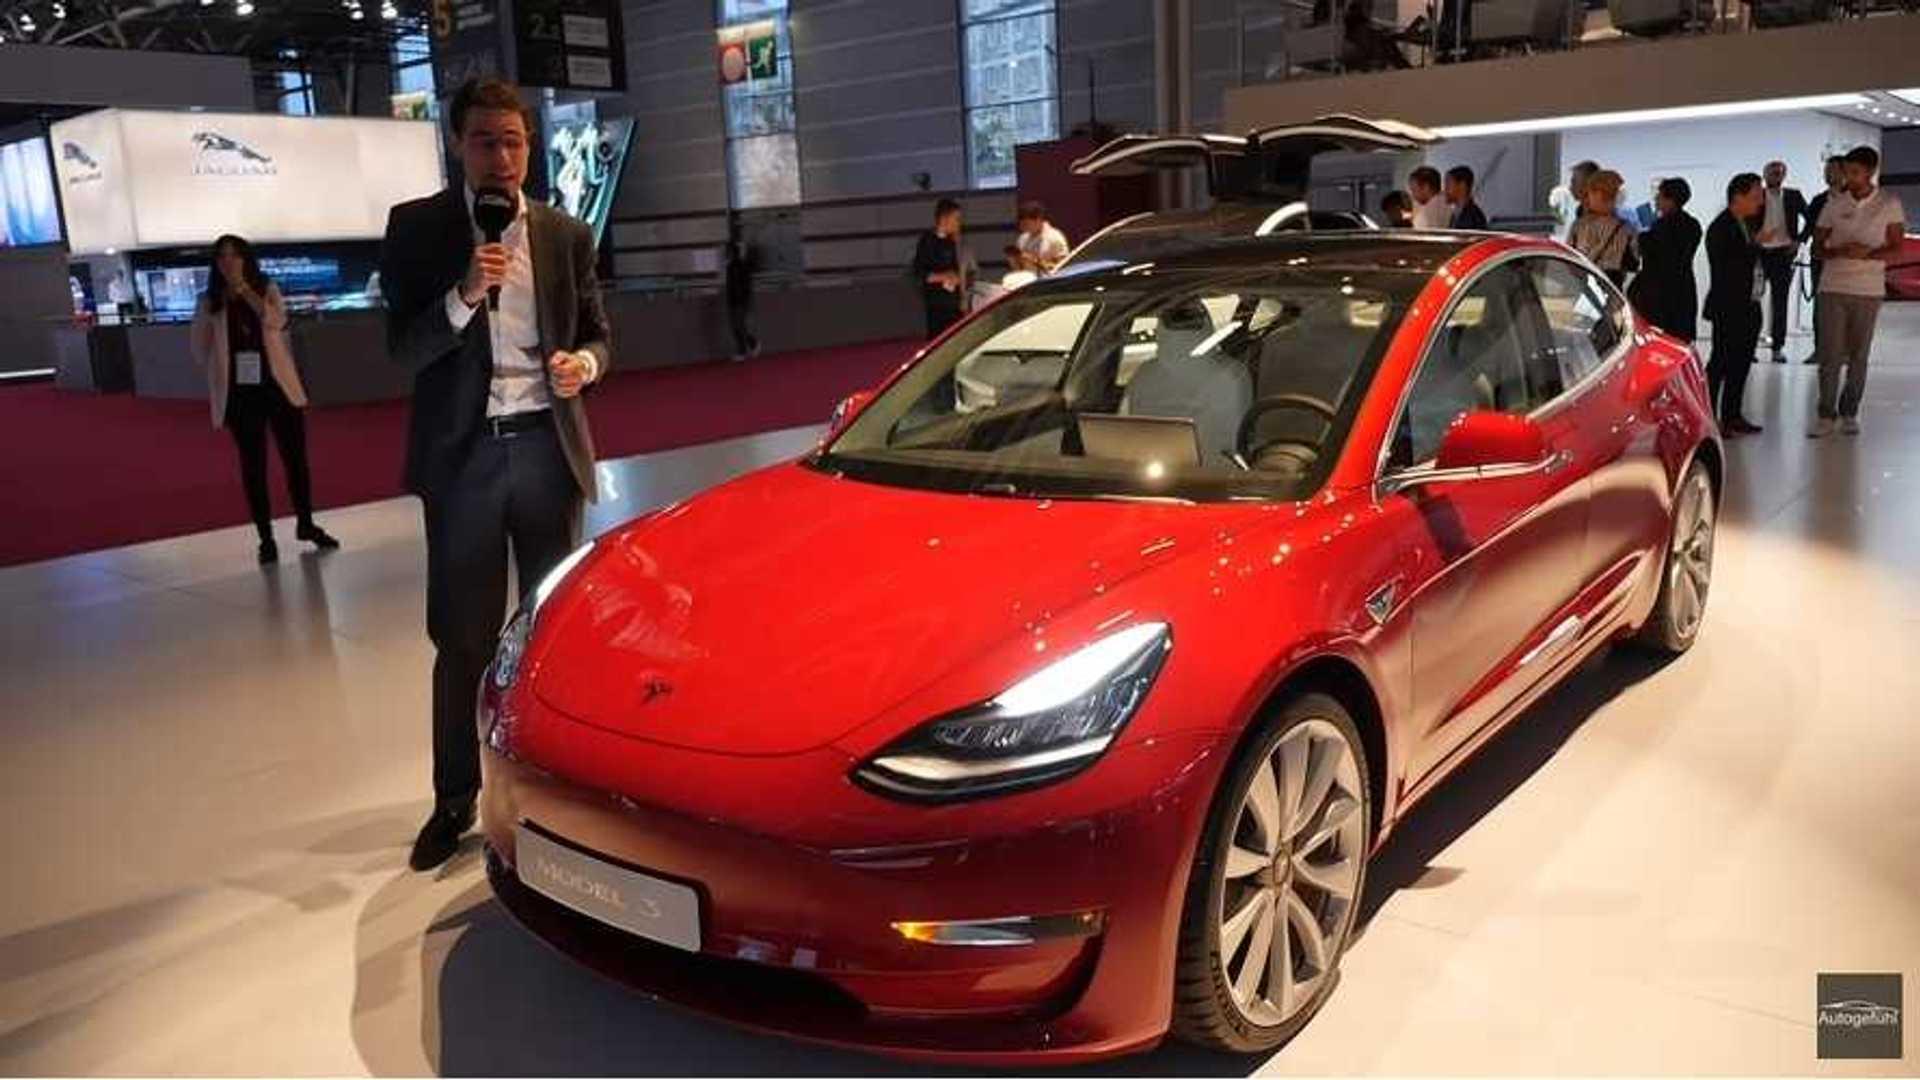 Autogefühl Checks Out The Tesla Model 3 In Paris